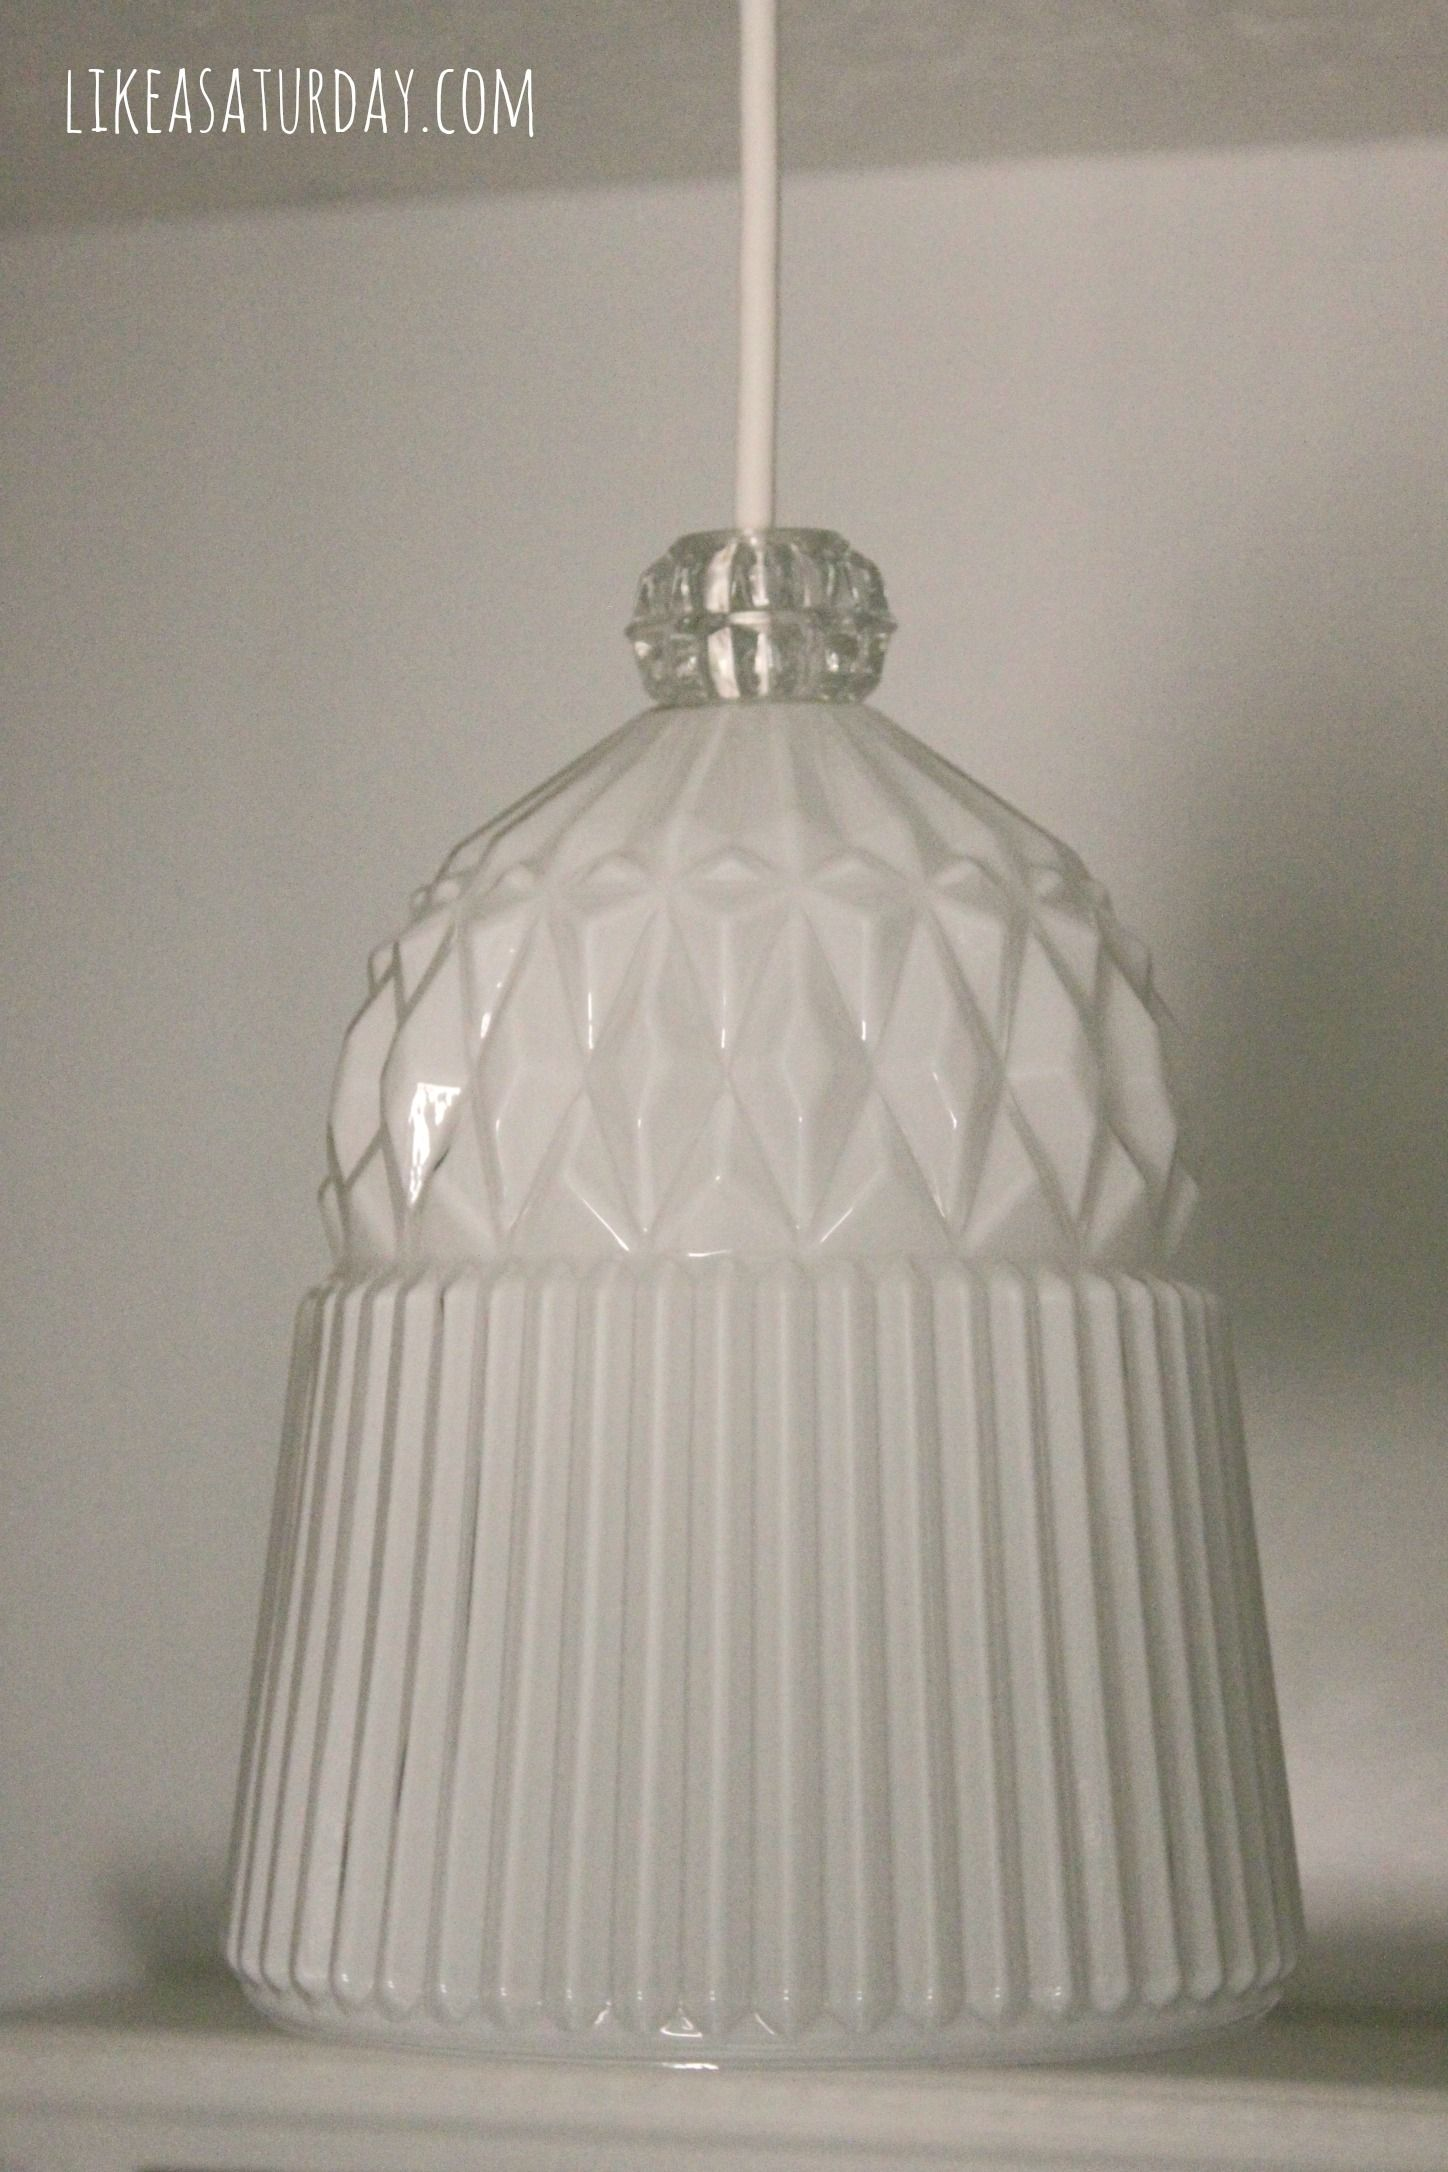 bathroom pendant lighting. Bathroom Pendant Lights From IKEA - $20 Lighting S